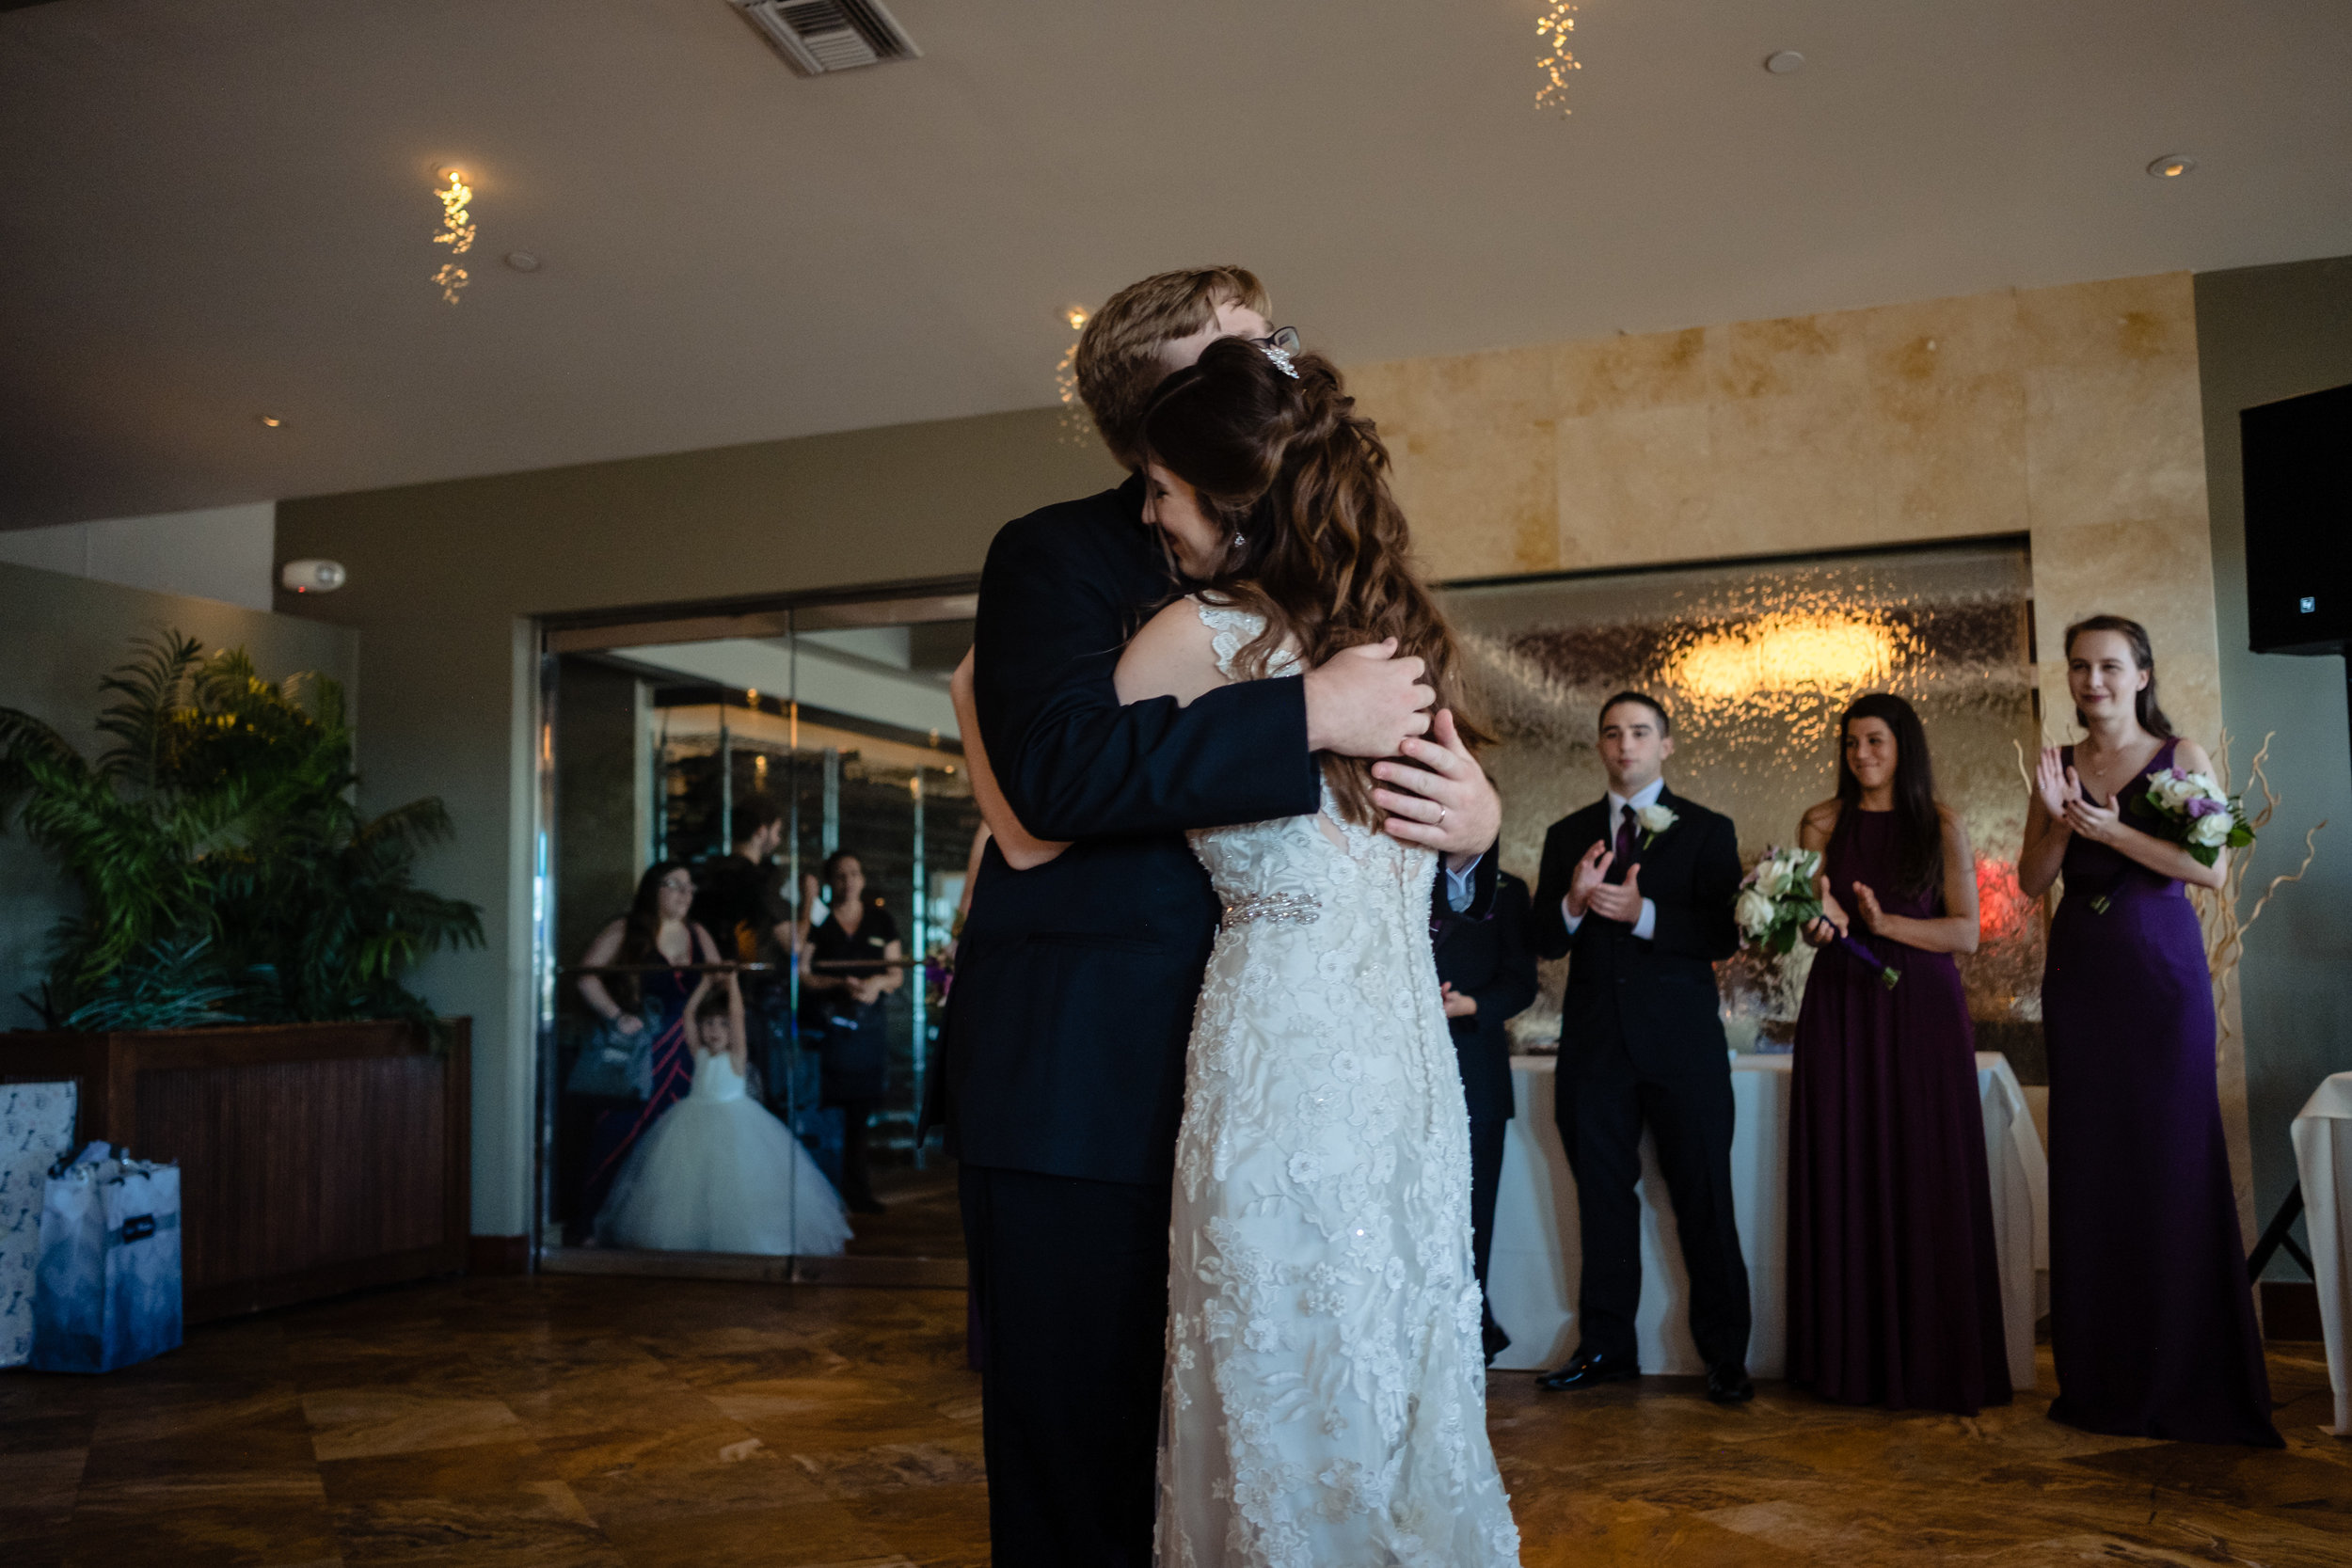 HAH_Zoe and Daniel_Clearwater Wedding_404_2018.jpg